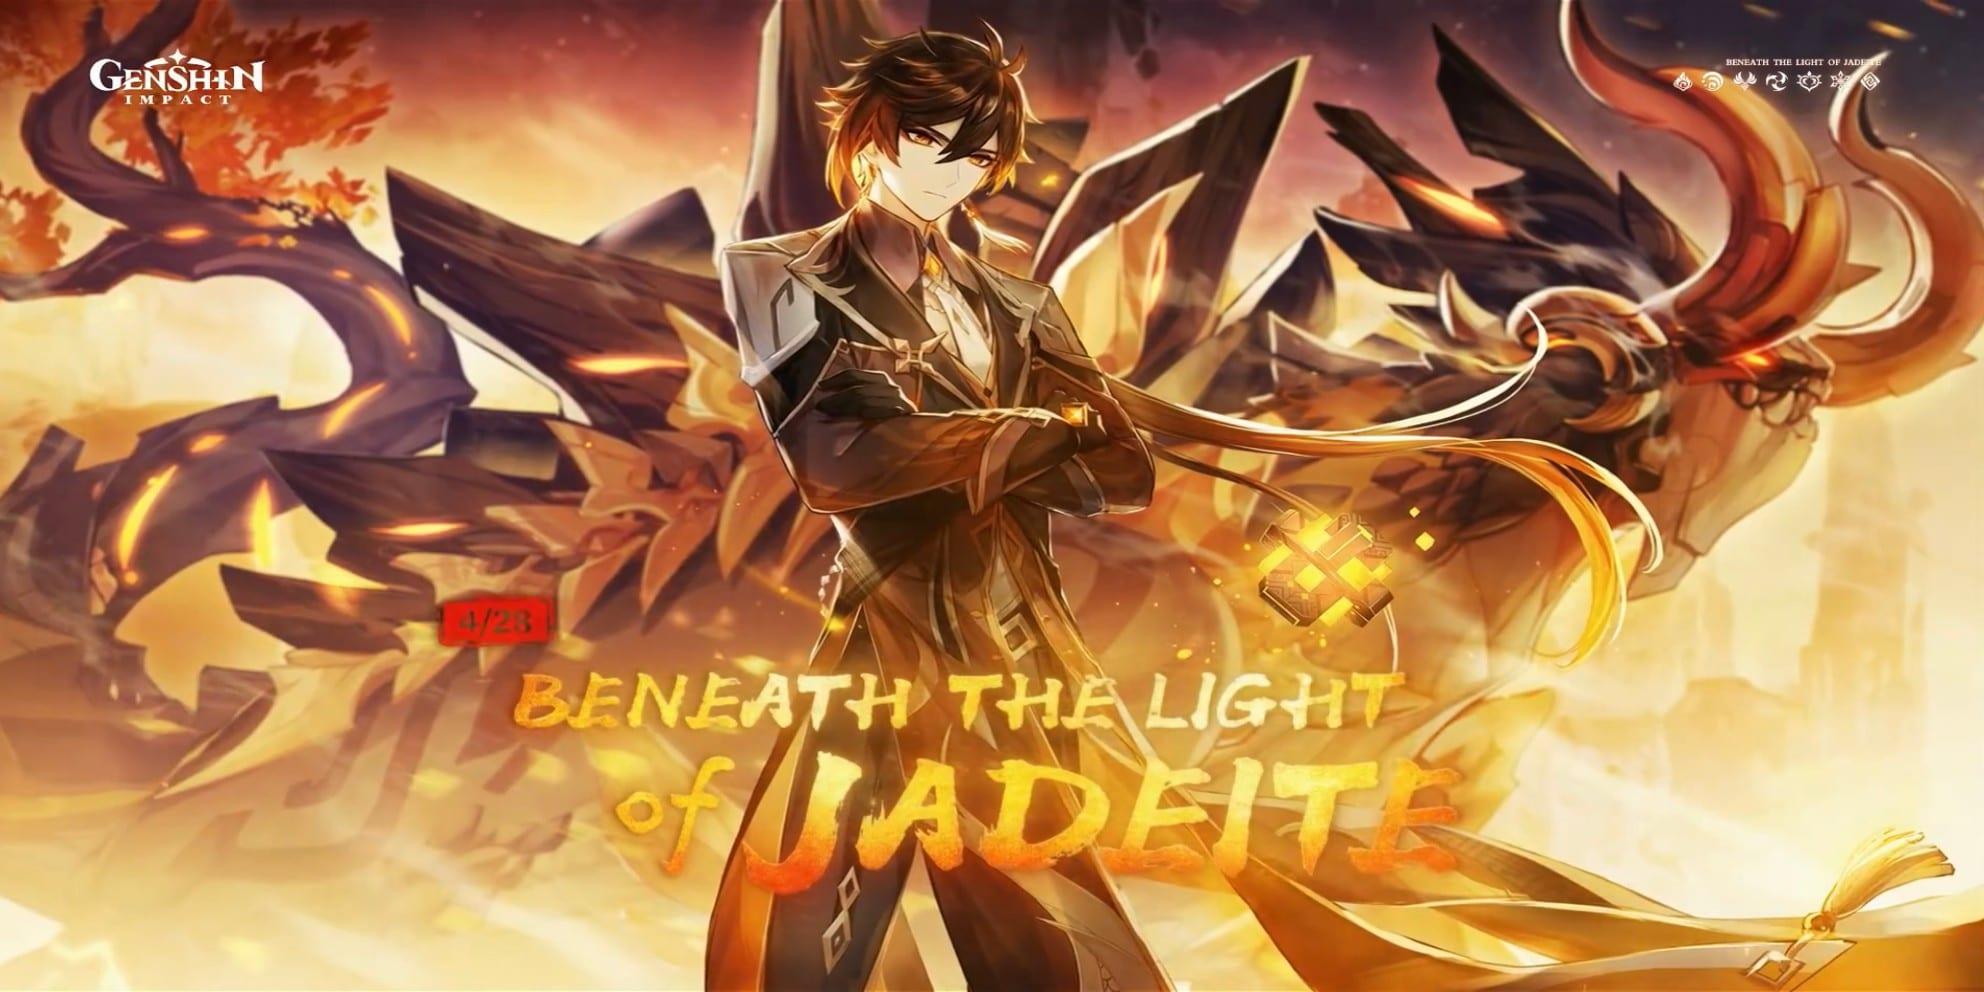 Genshin Impact 1.5 Update: Beneath the Light of Jadeite, Yanfei, PS5 Improvements, and More!